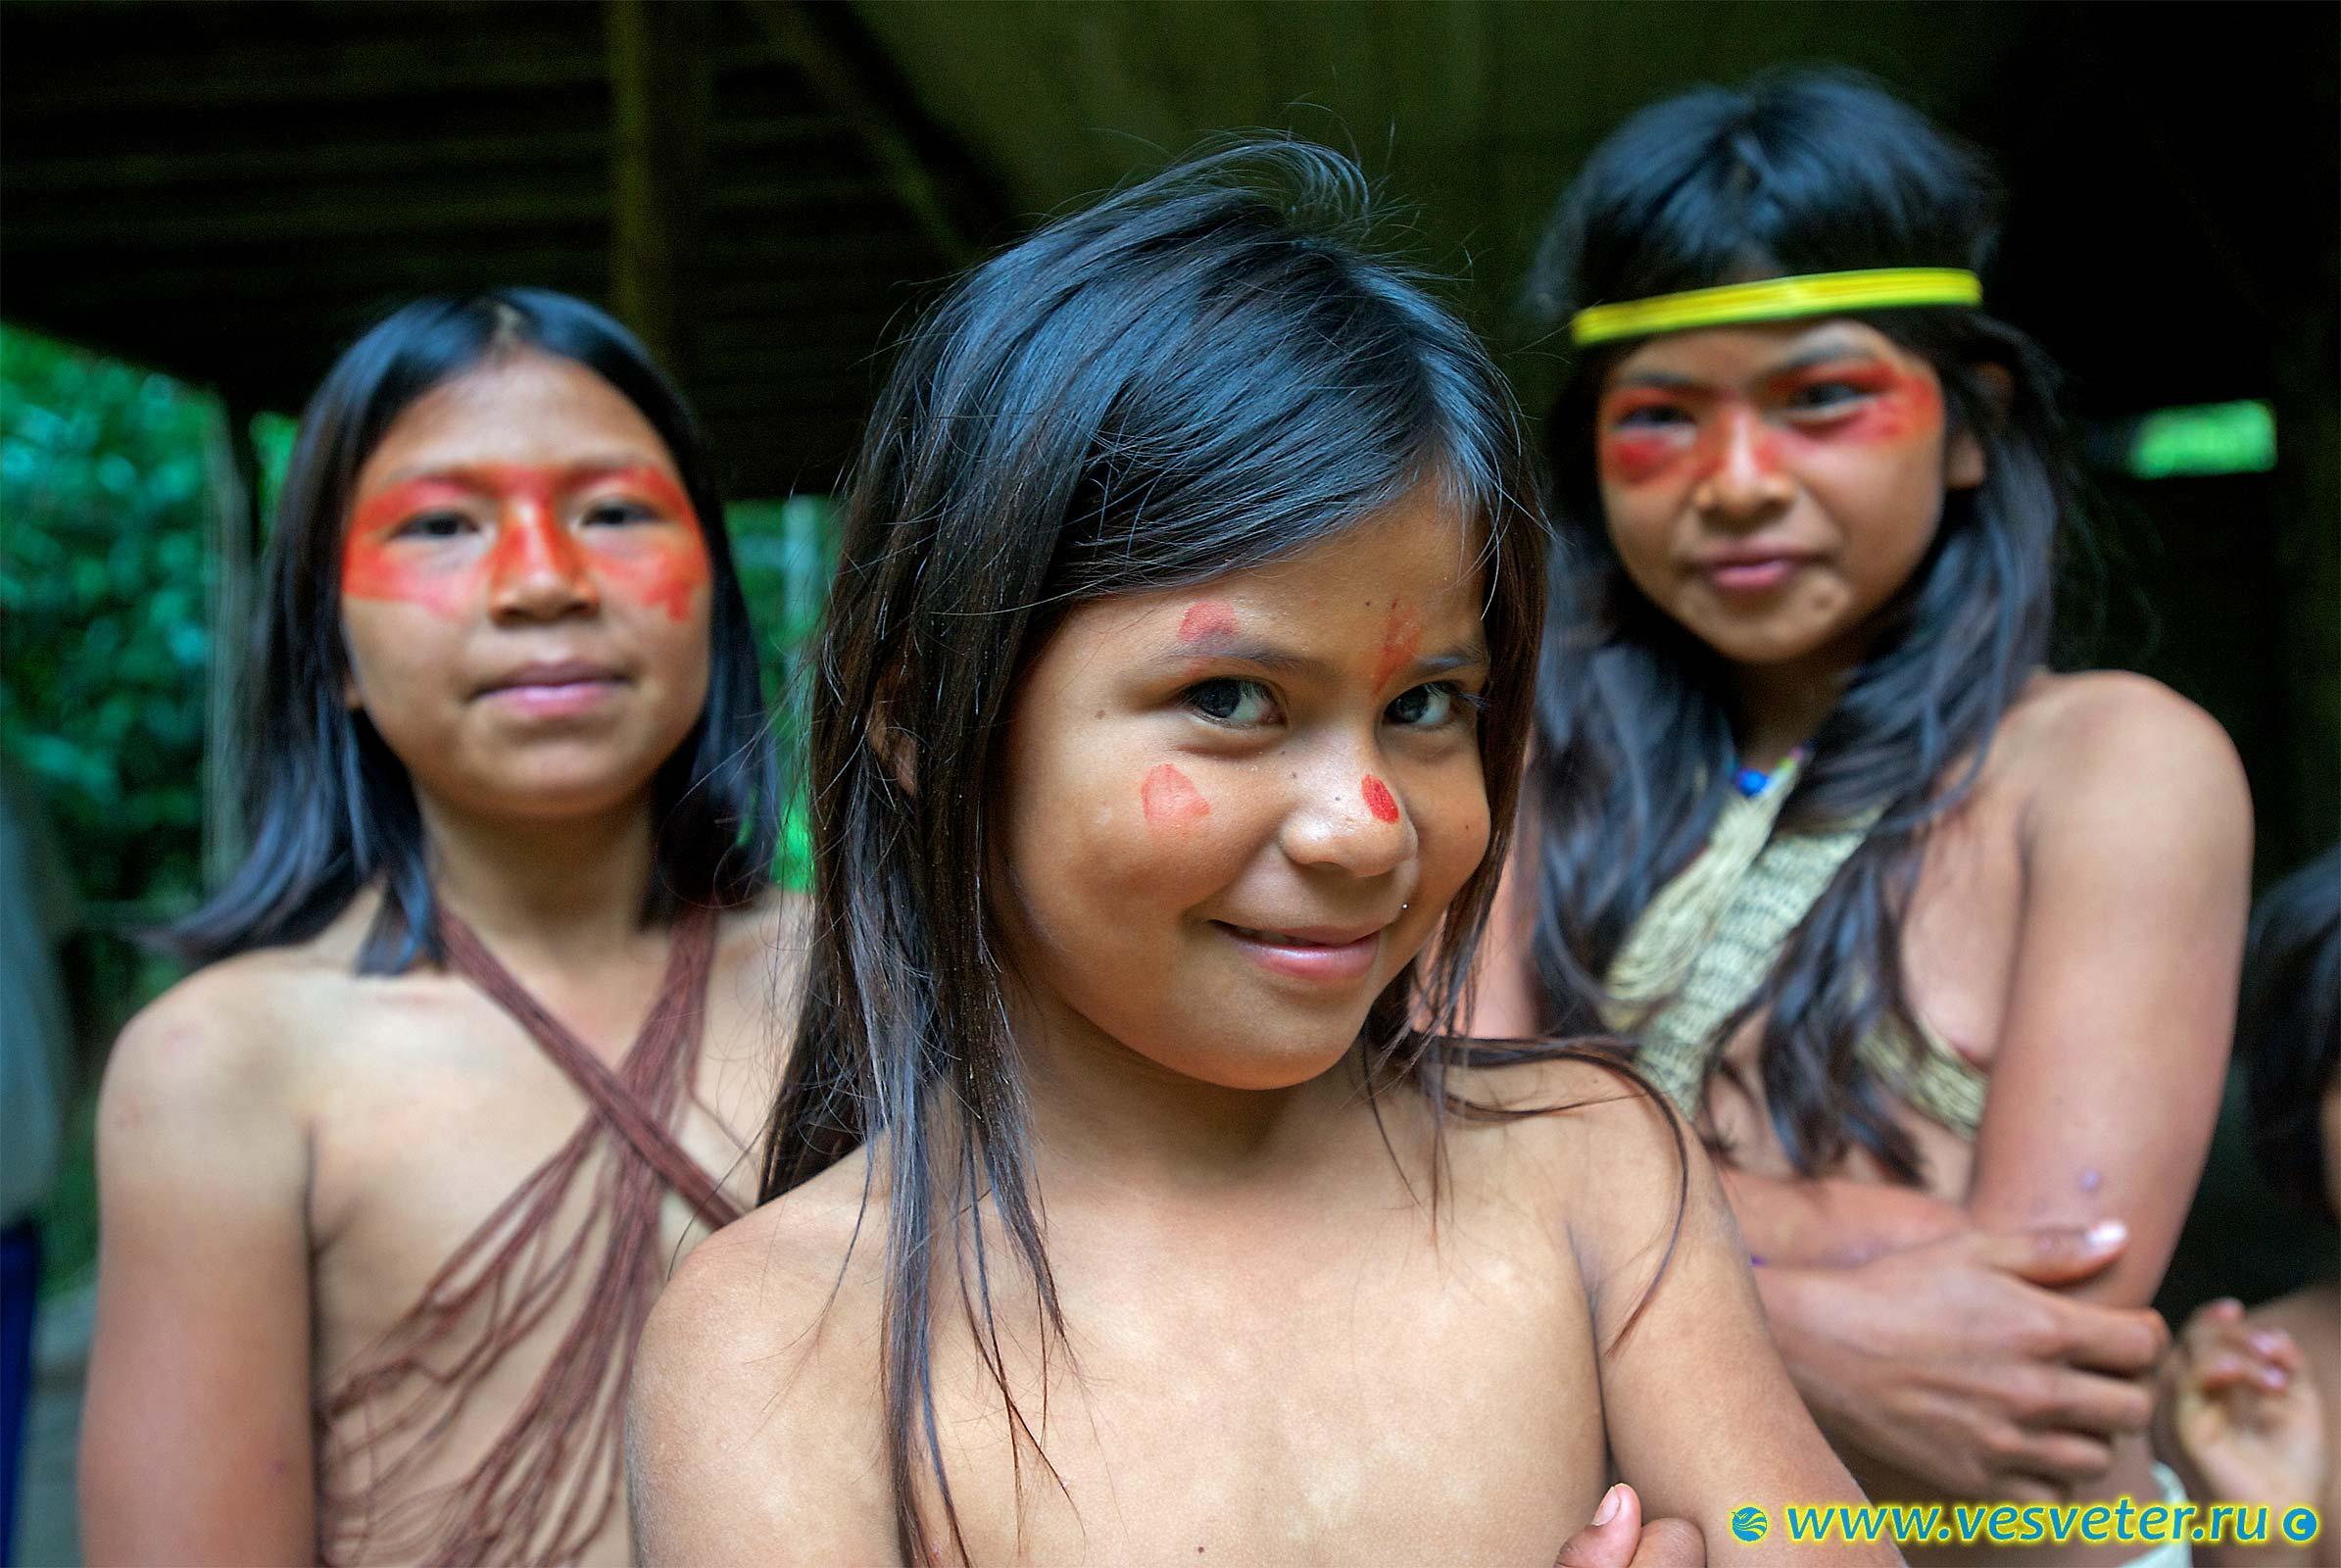 Porn amazonic tribe nude vista xxx pic